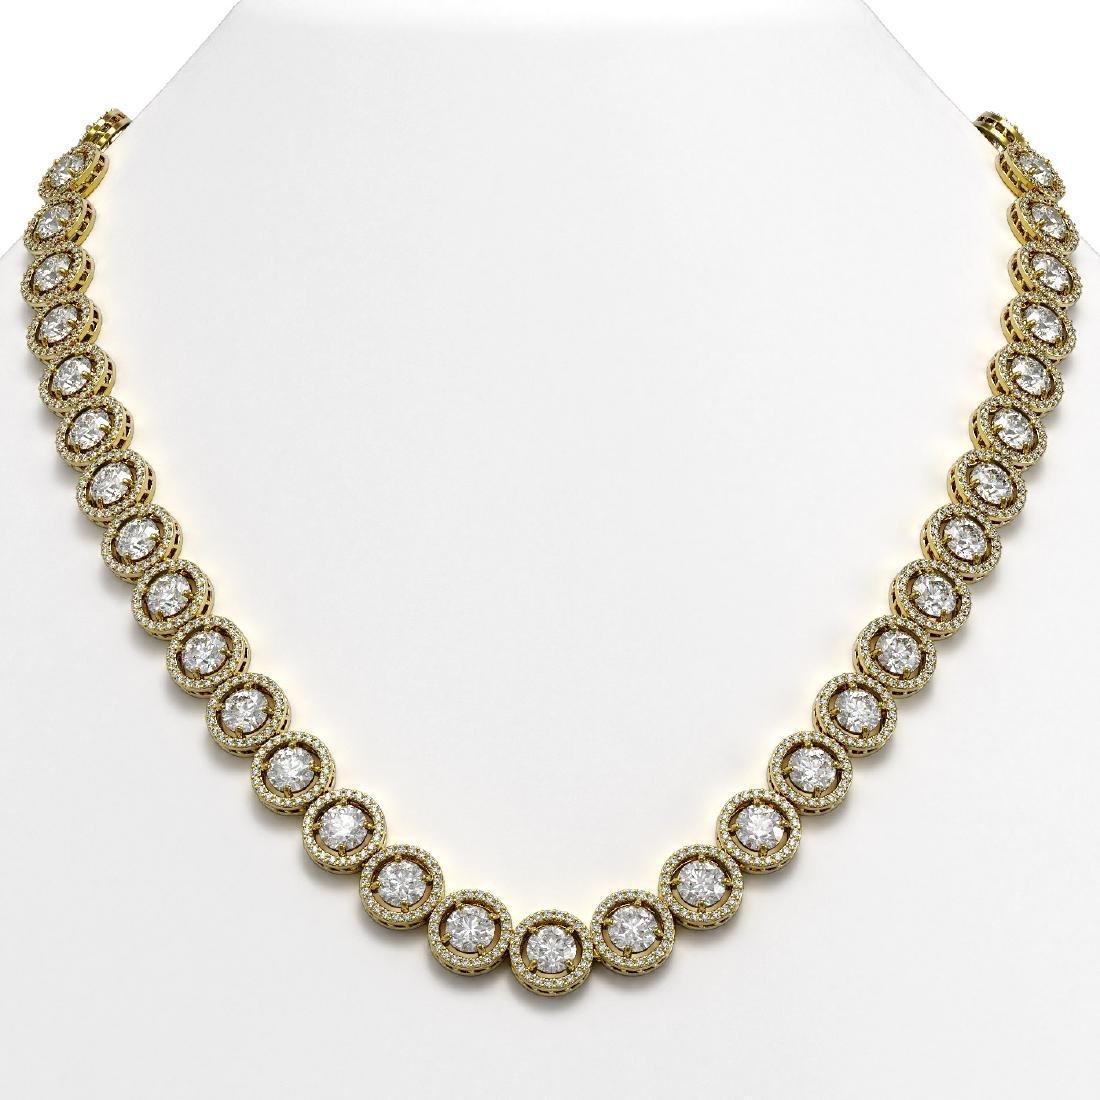 30.78 CTW Diamond Designer Necklace 18K Yellow Gold